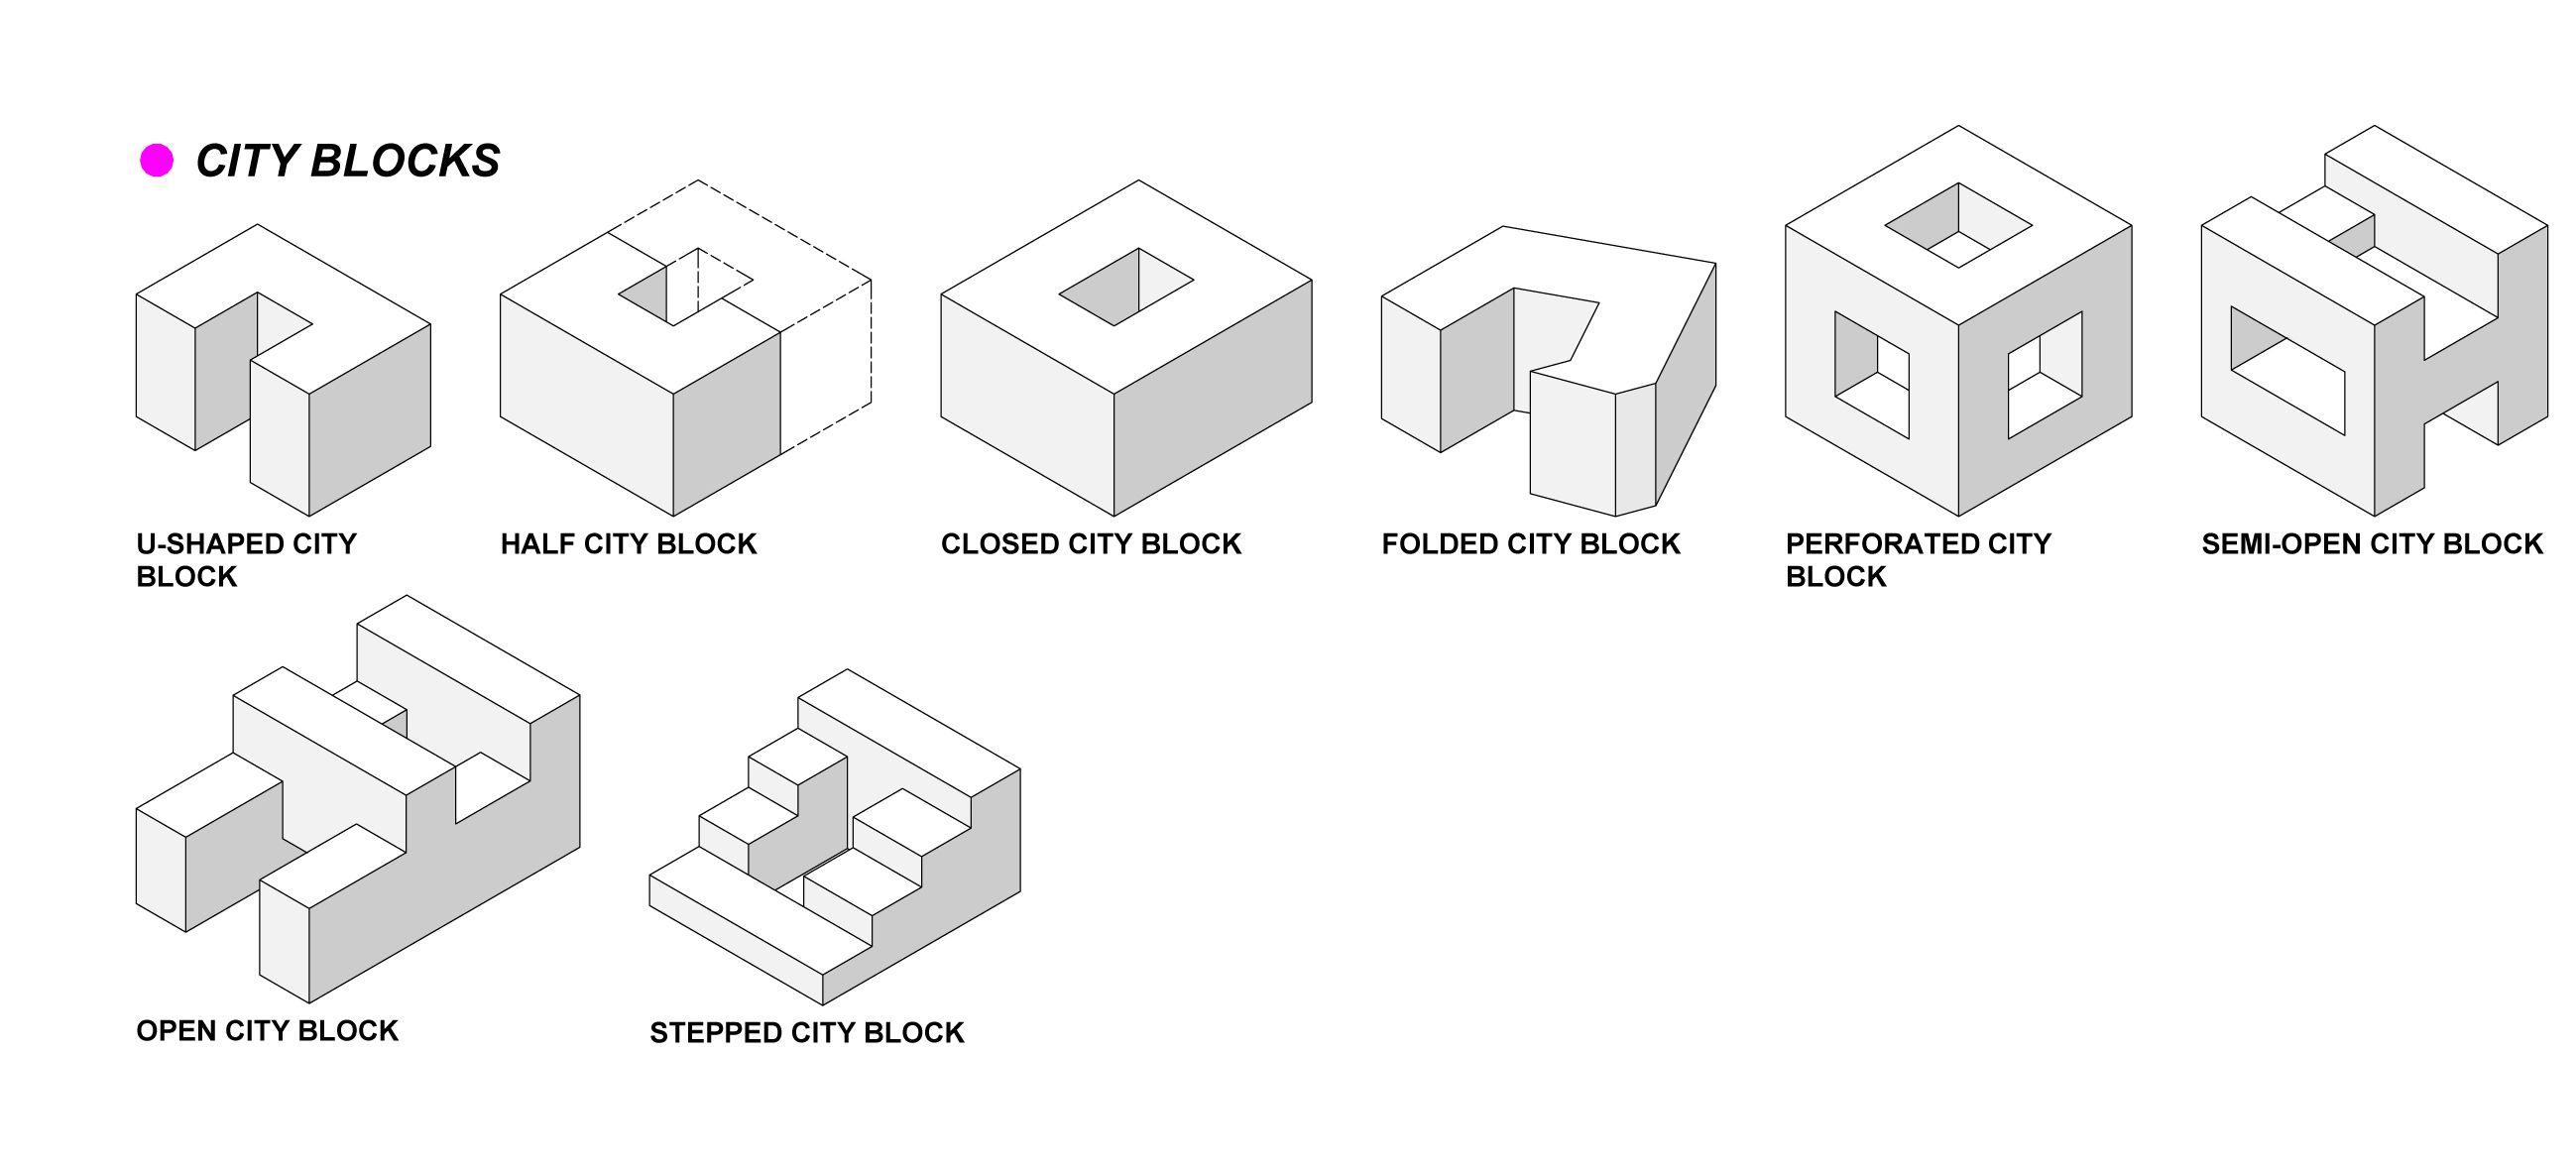 Block Typology